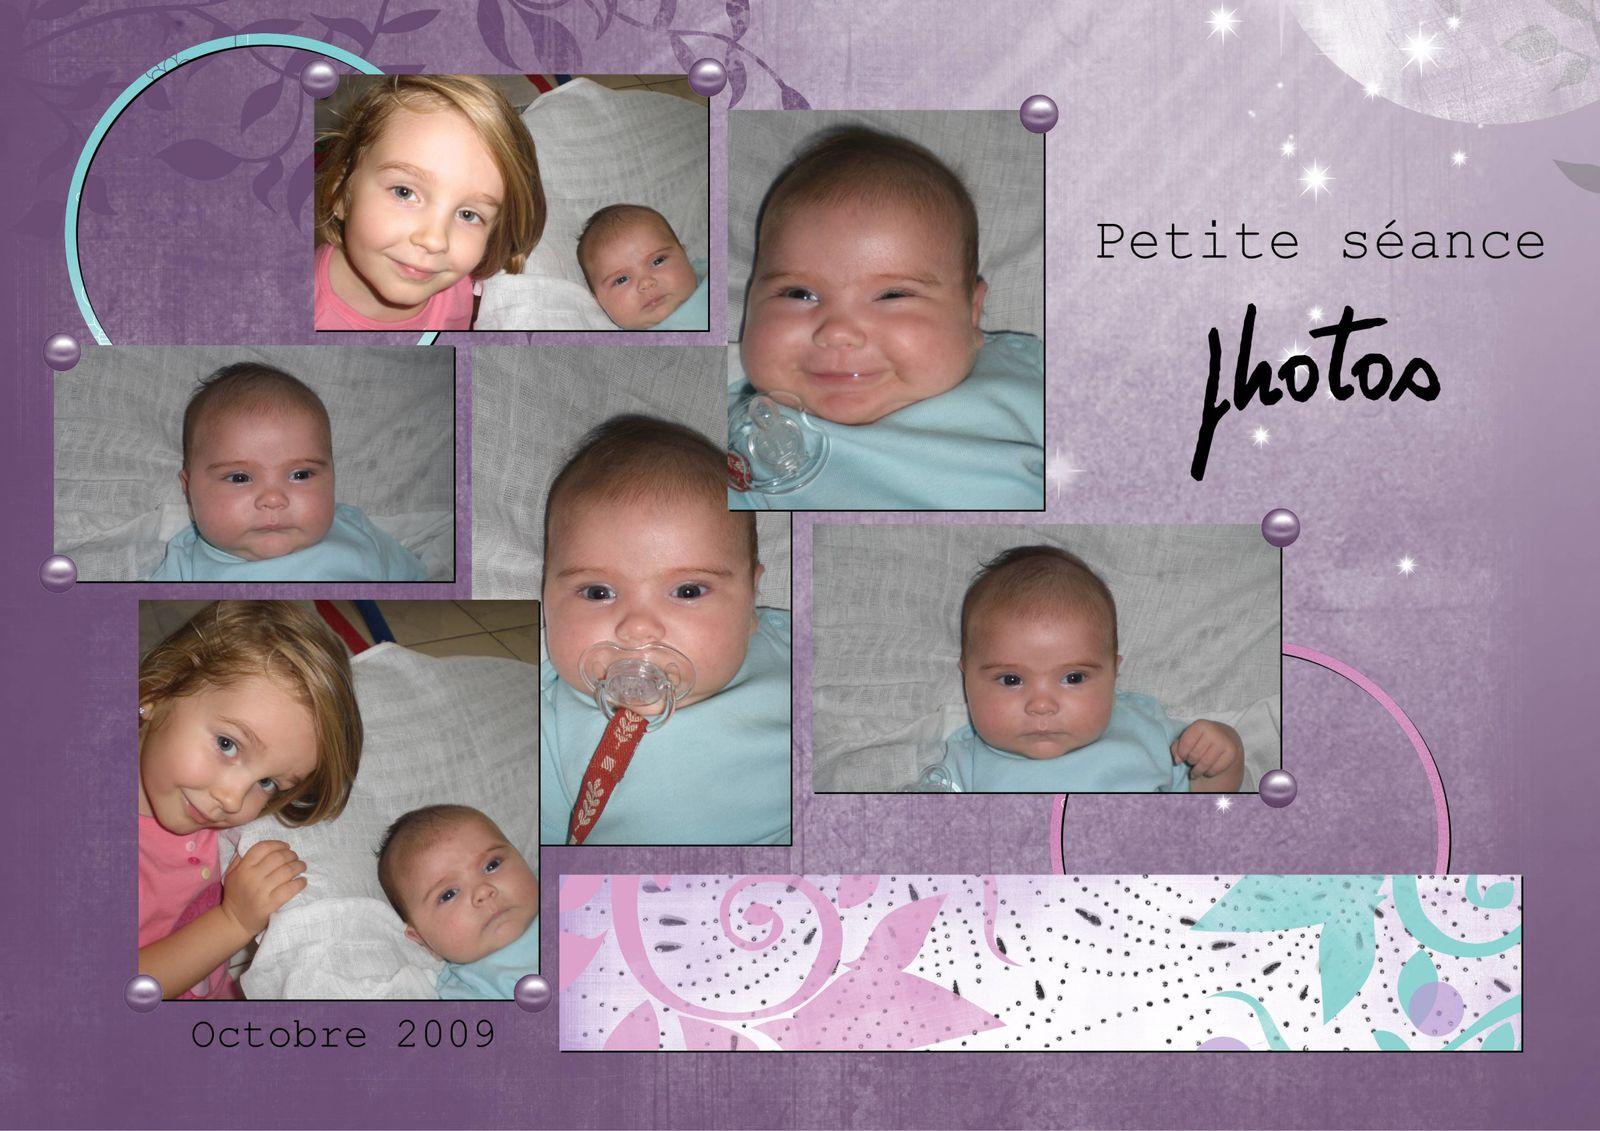 Petite-s-ance-photos.jpg